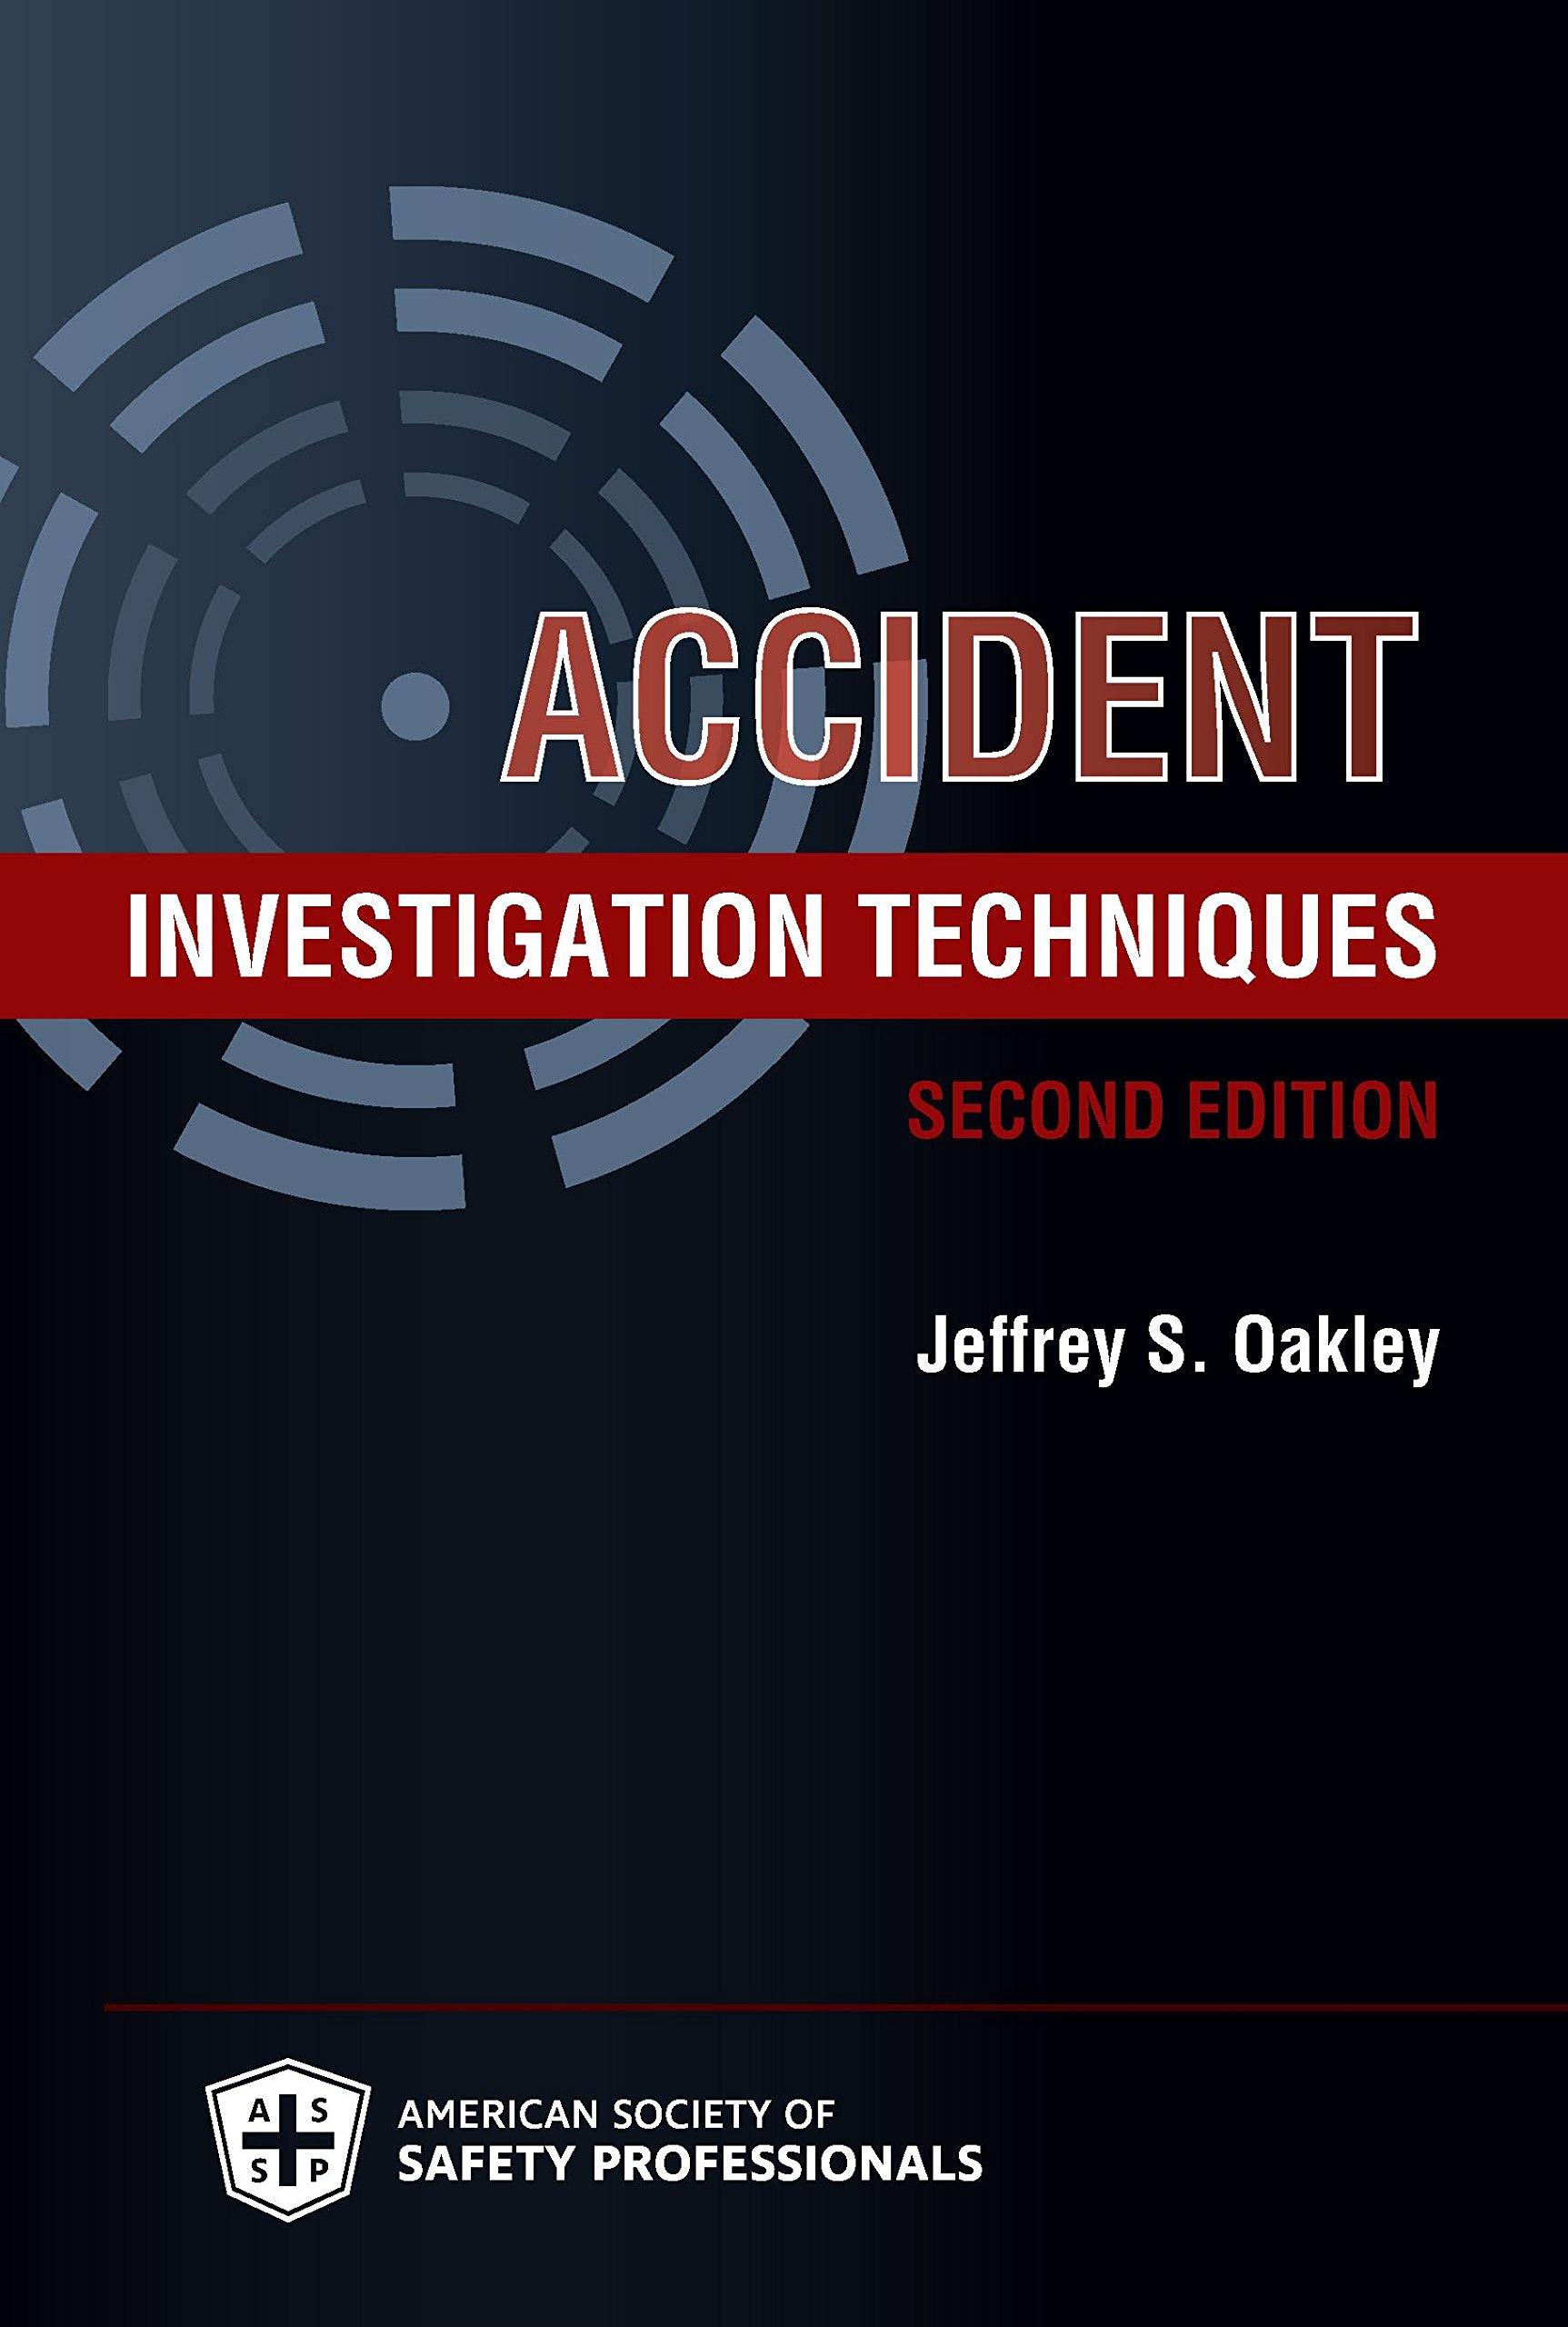 Accident Investigation Techniques, Second Edition: Jeffrey S. Oakley:  9781885581624: Amazon.com: Books